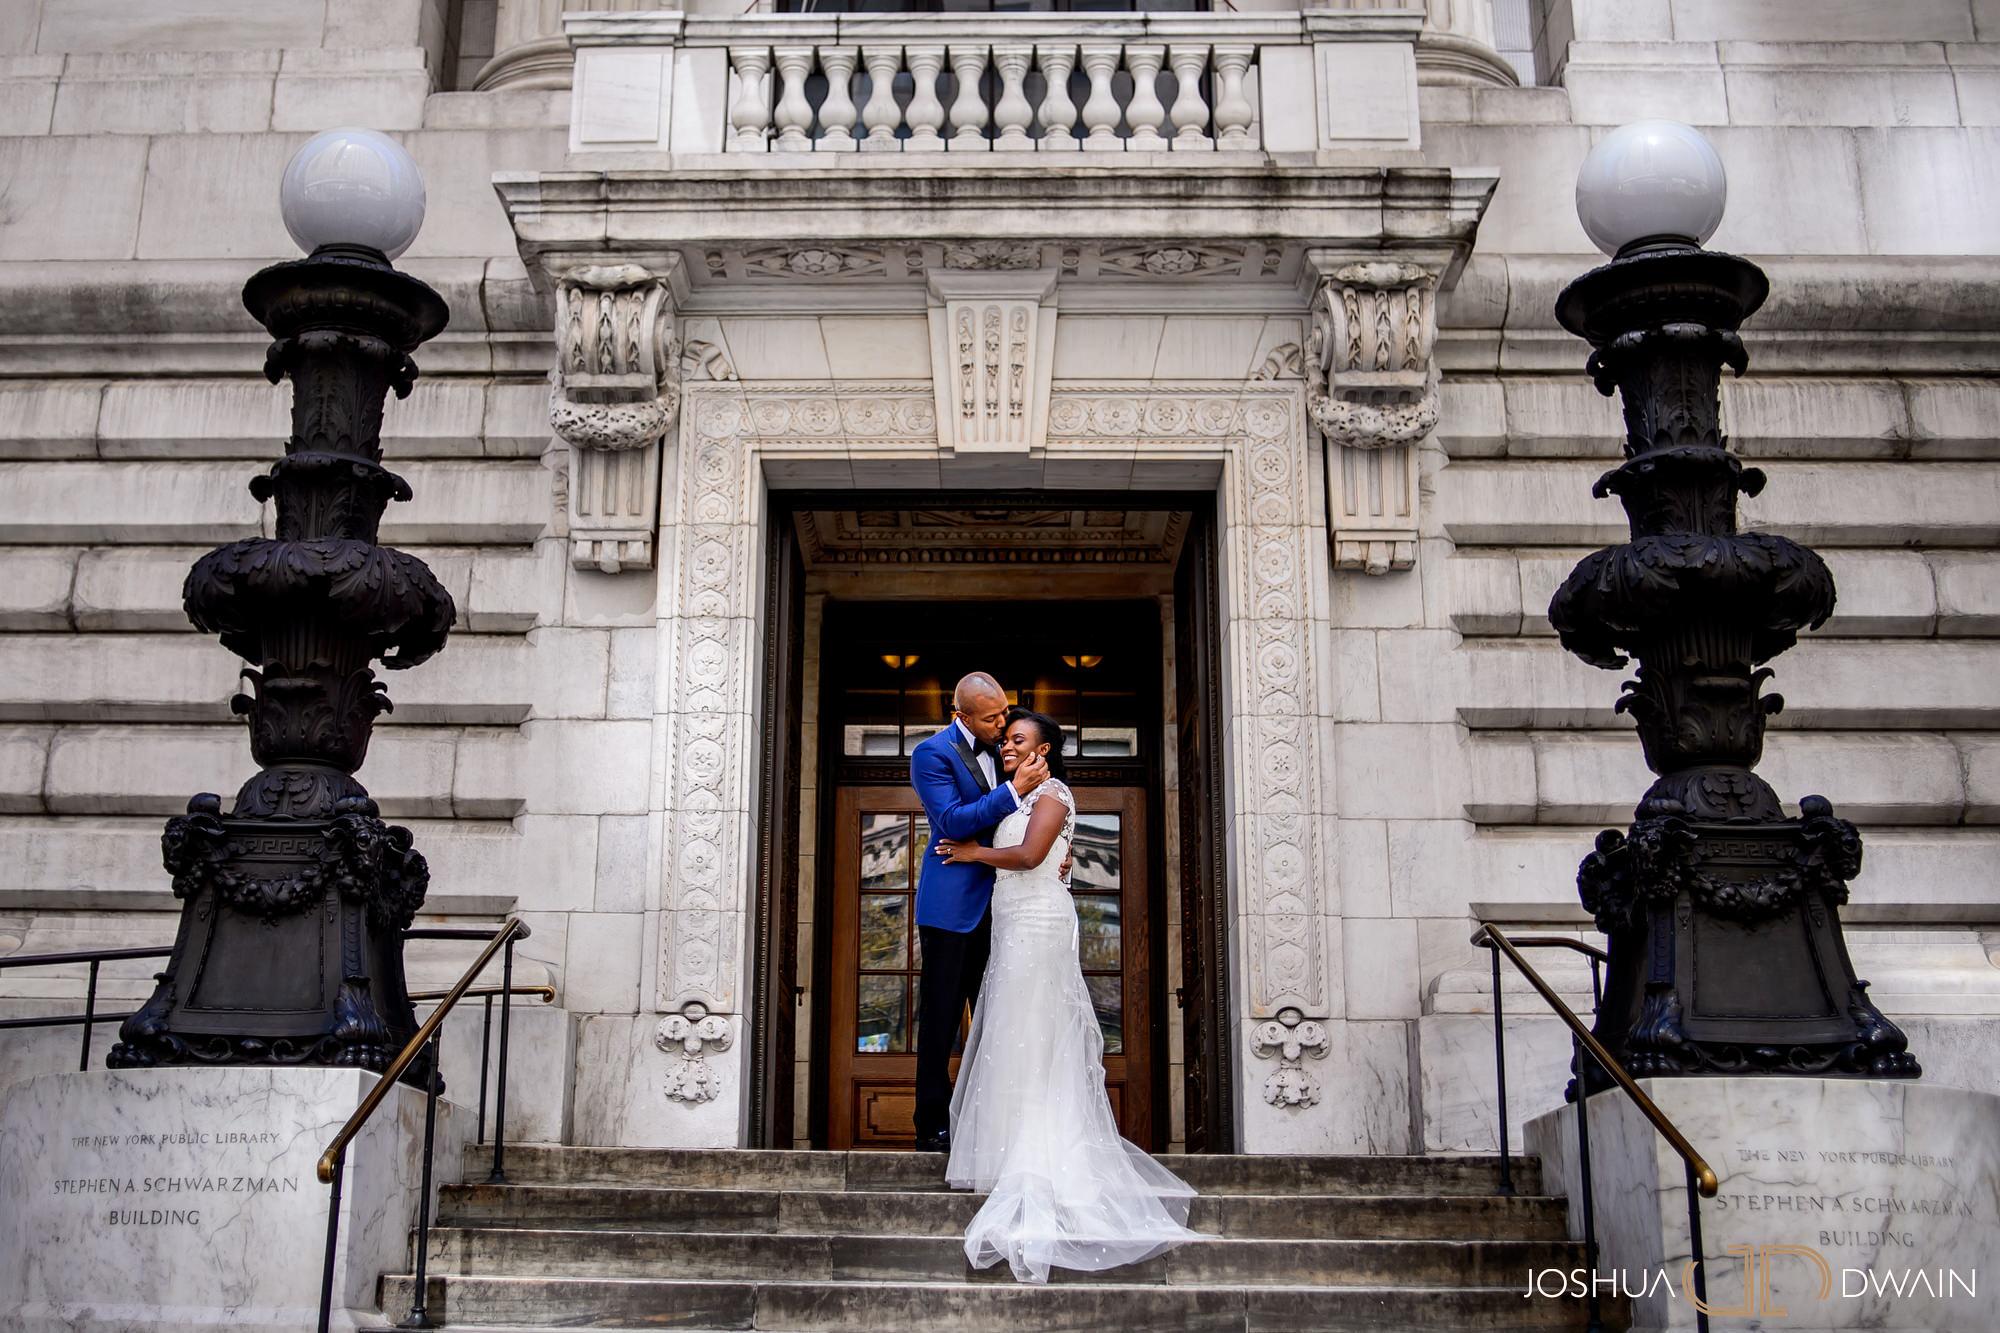 joshua-dwain-weddings-gallery-best-wedding-photographers-us-018